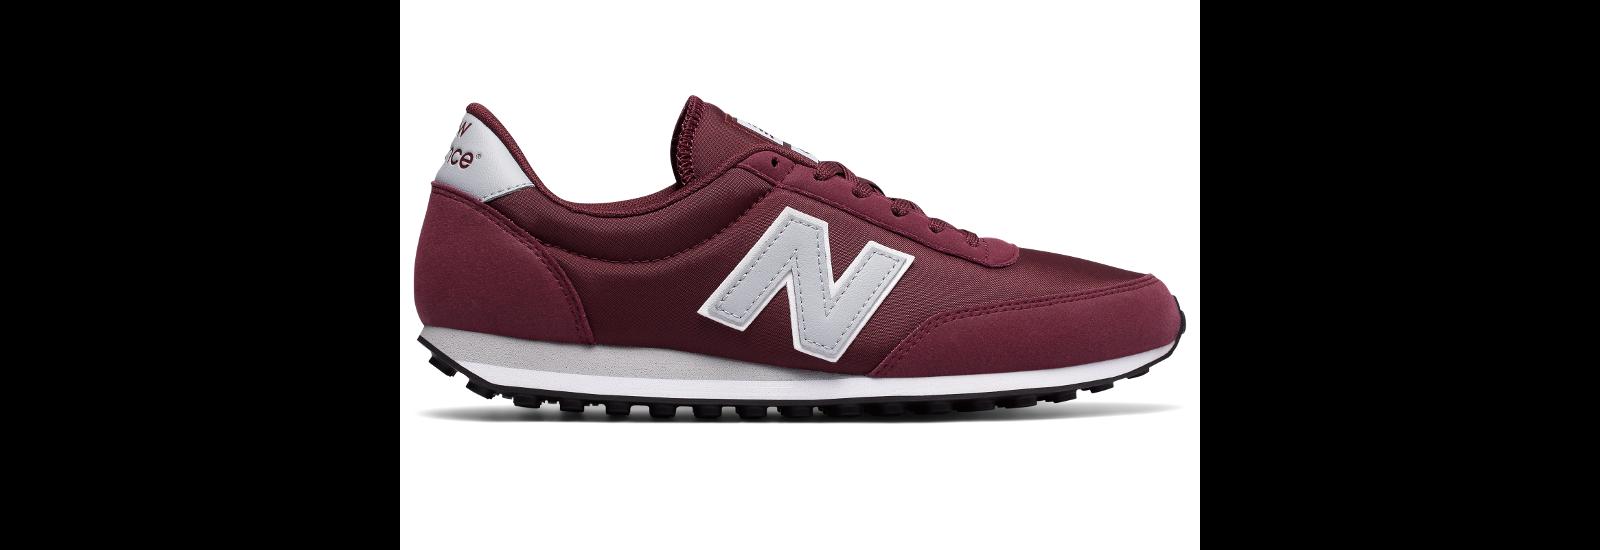 05b79d70fb New Balance U410BUG | Shoes | New balance, Shoes, Sneakers